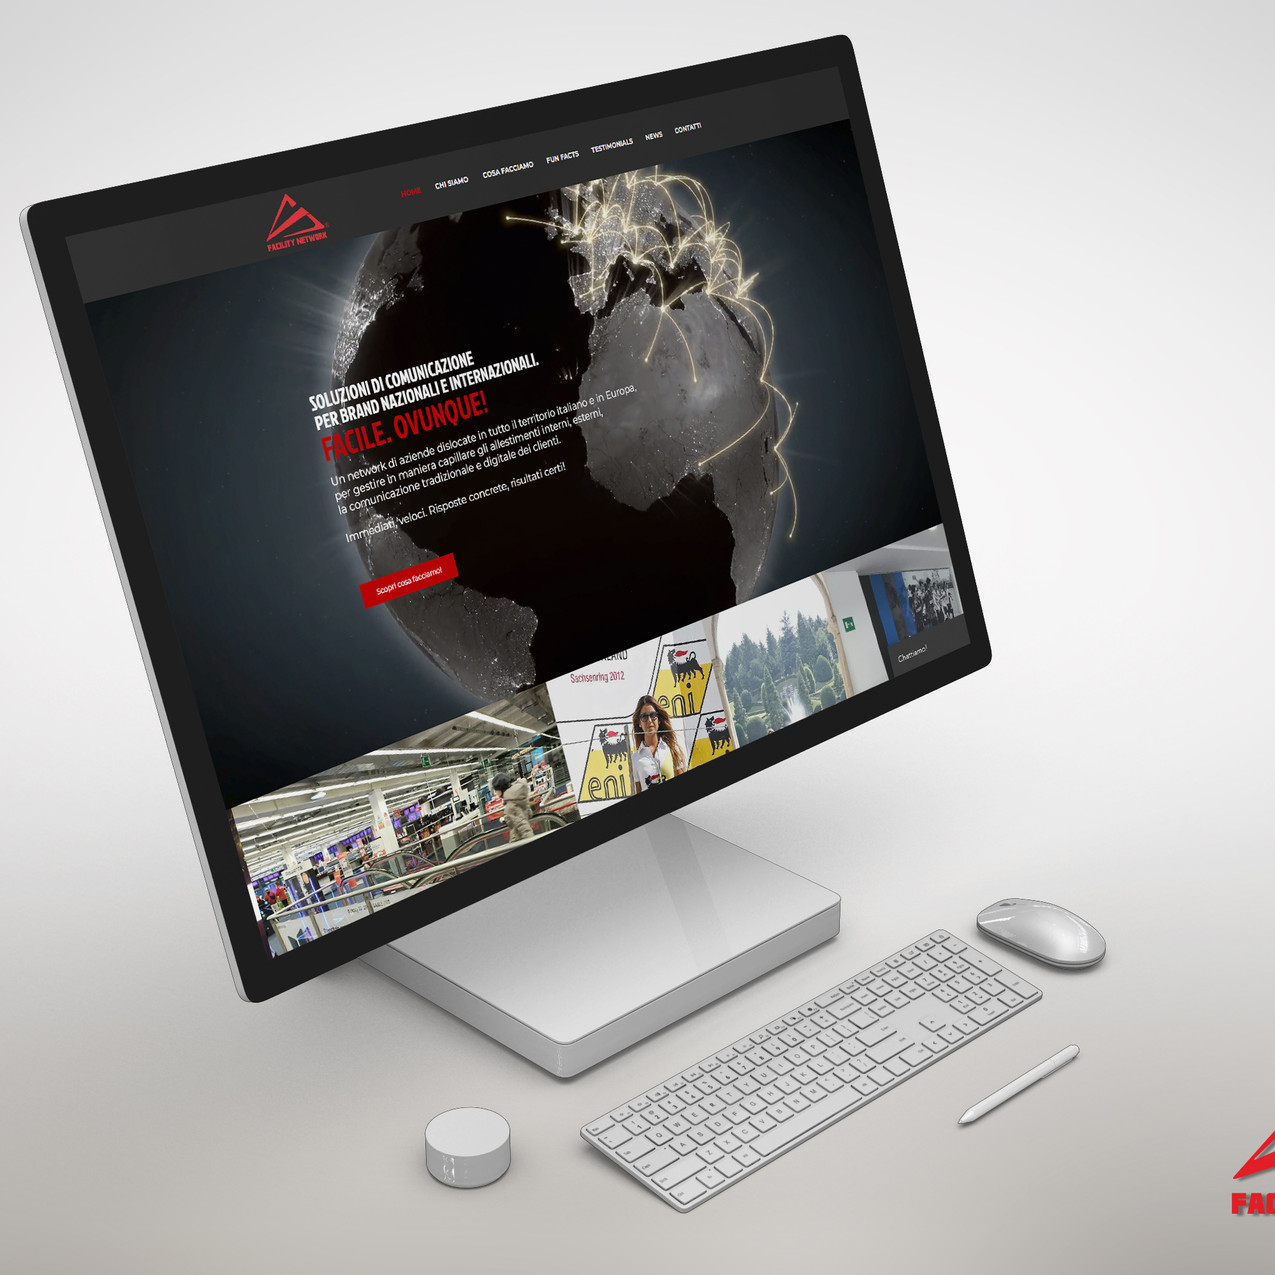 MOCKUP 2 - FACILITY NETWORK WEB